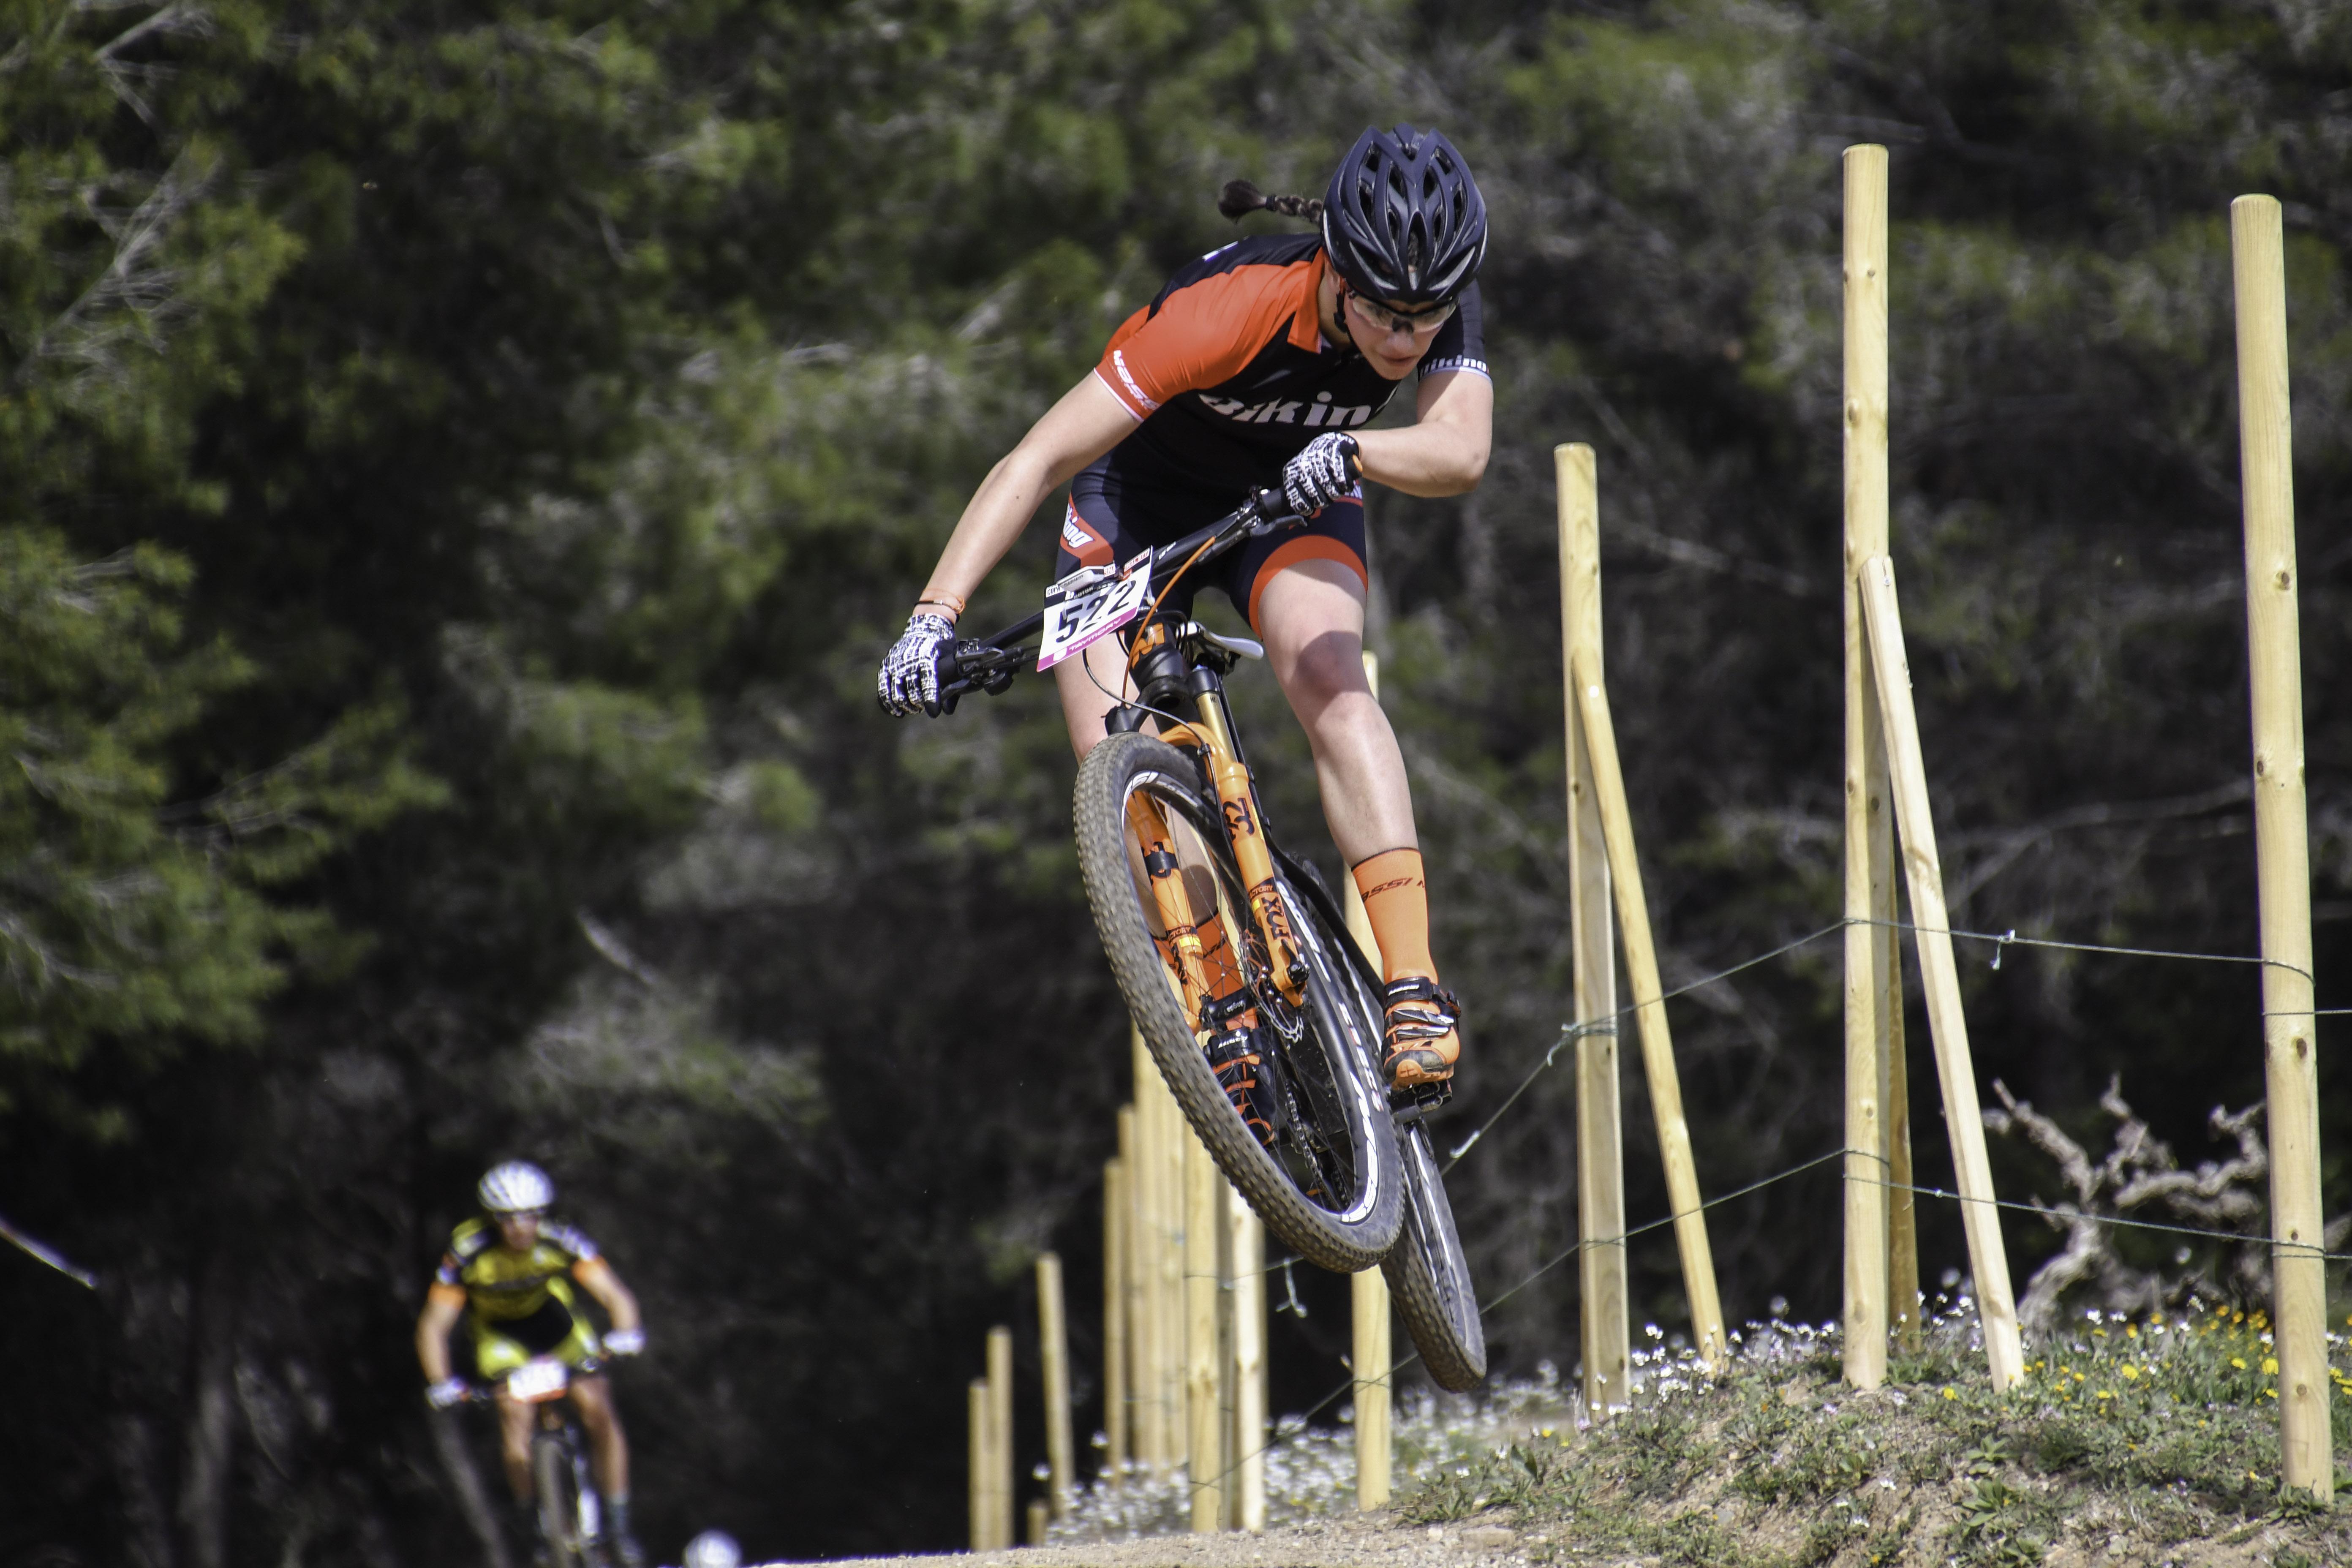 Corró d'Amunt vive otra fiesta del XCO con la Copa Catalana Internacional Biking Point